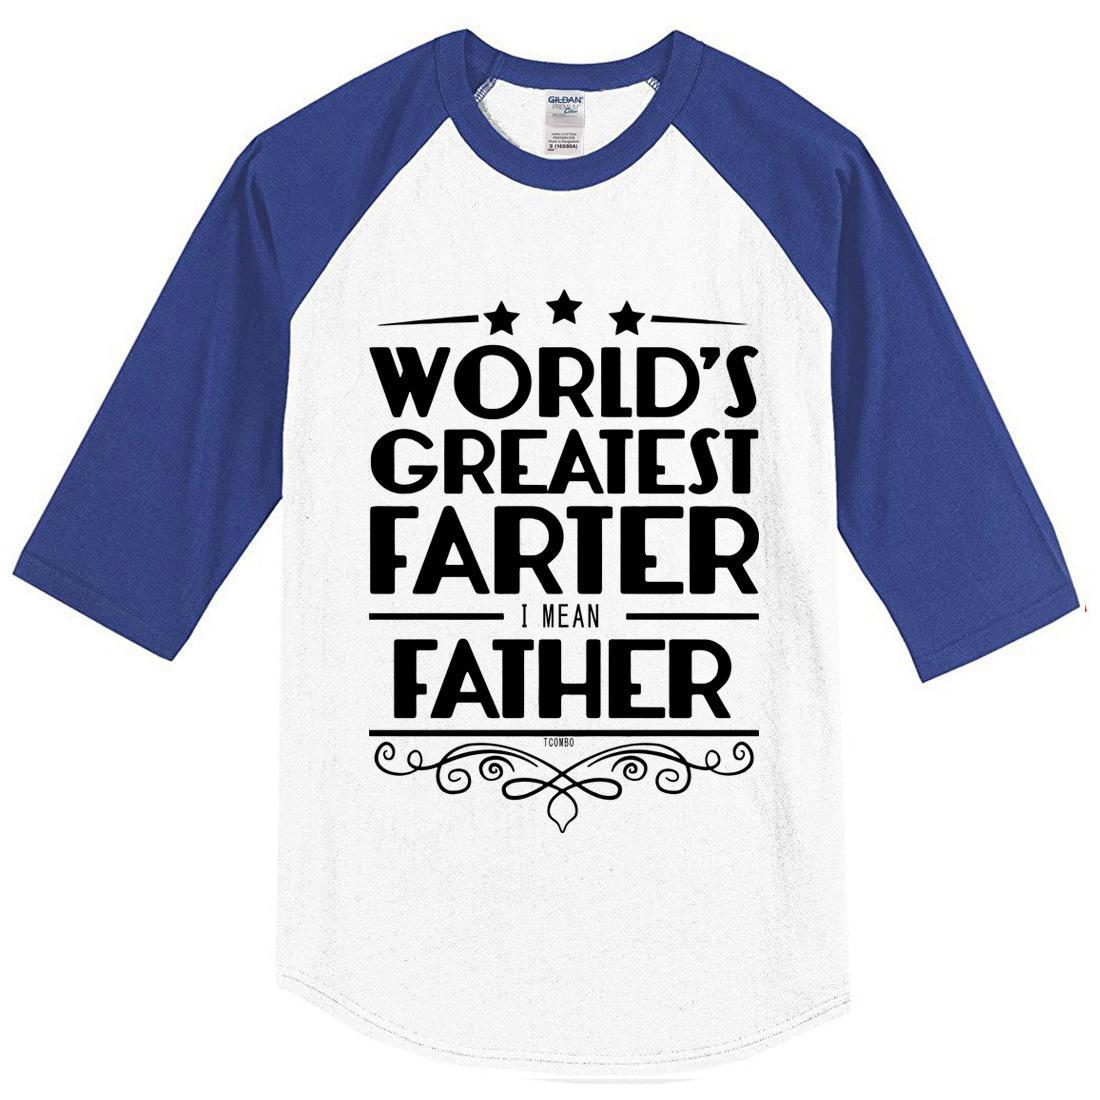 601a1aaa 2019 Summer Raglan T Shirt World'S Greatest Farter Father Funny T Shirt Men  Fashion Kpop Men'S T Shirts Sportswear Crossfit Top 10 T Shirt Awesome T  Shirts ...